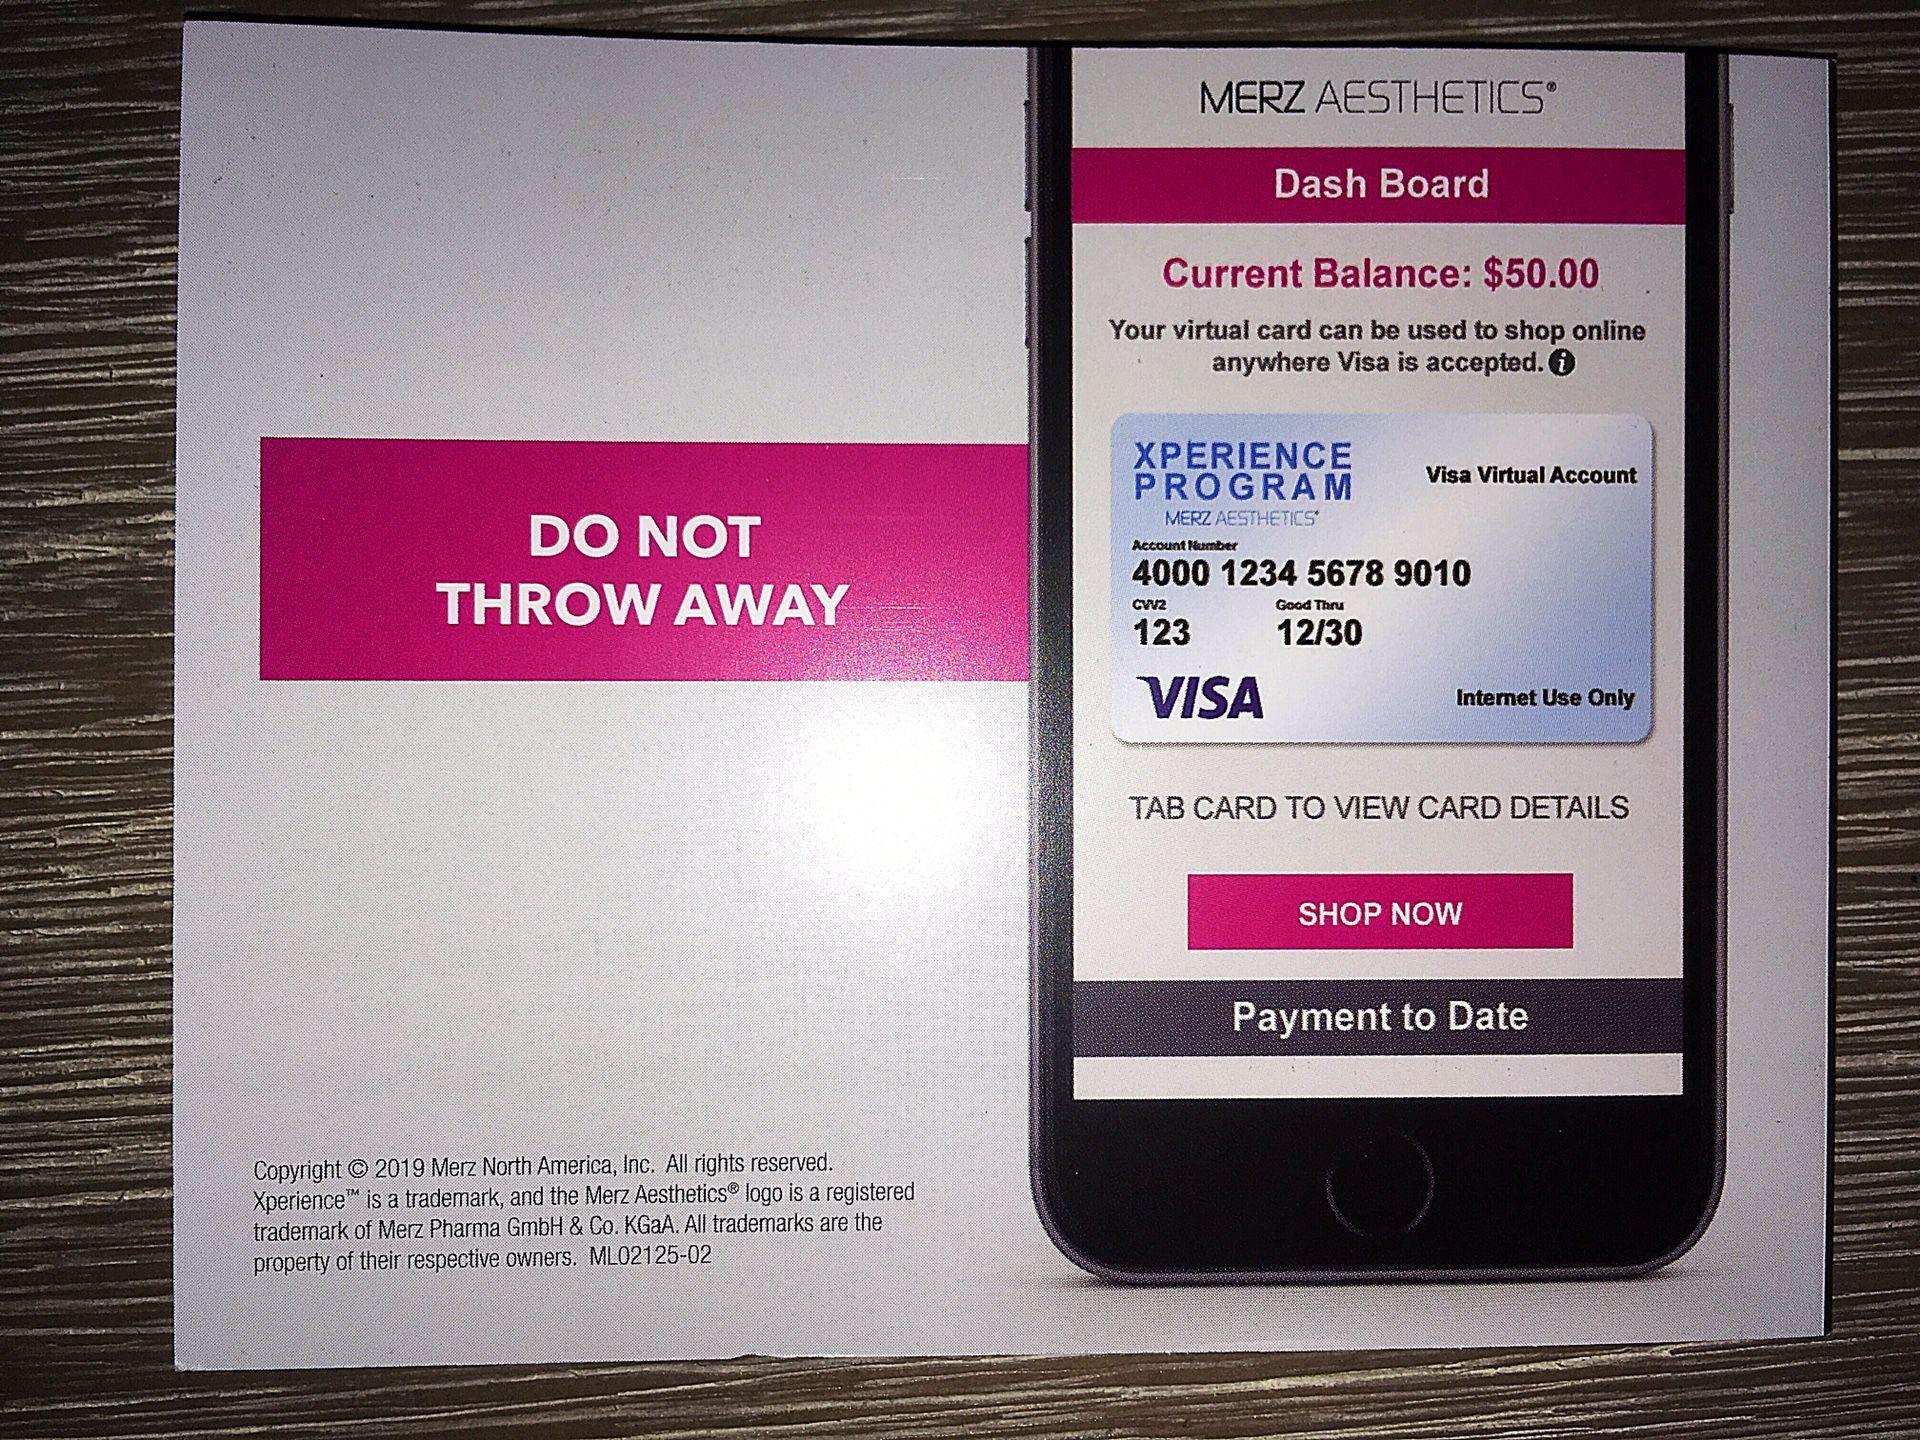 $50 Reward Pin Card - Merz Aesthetics Virtual Xperience Program